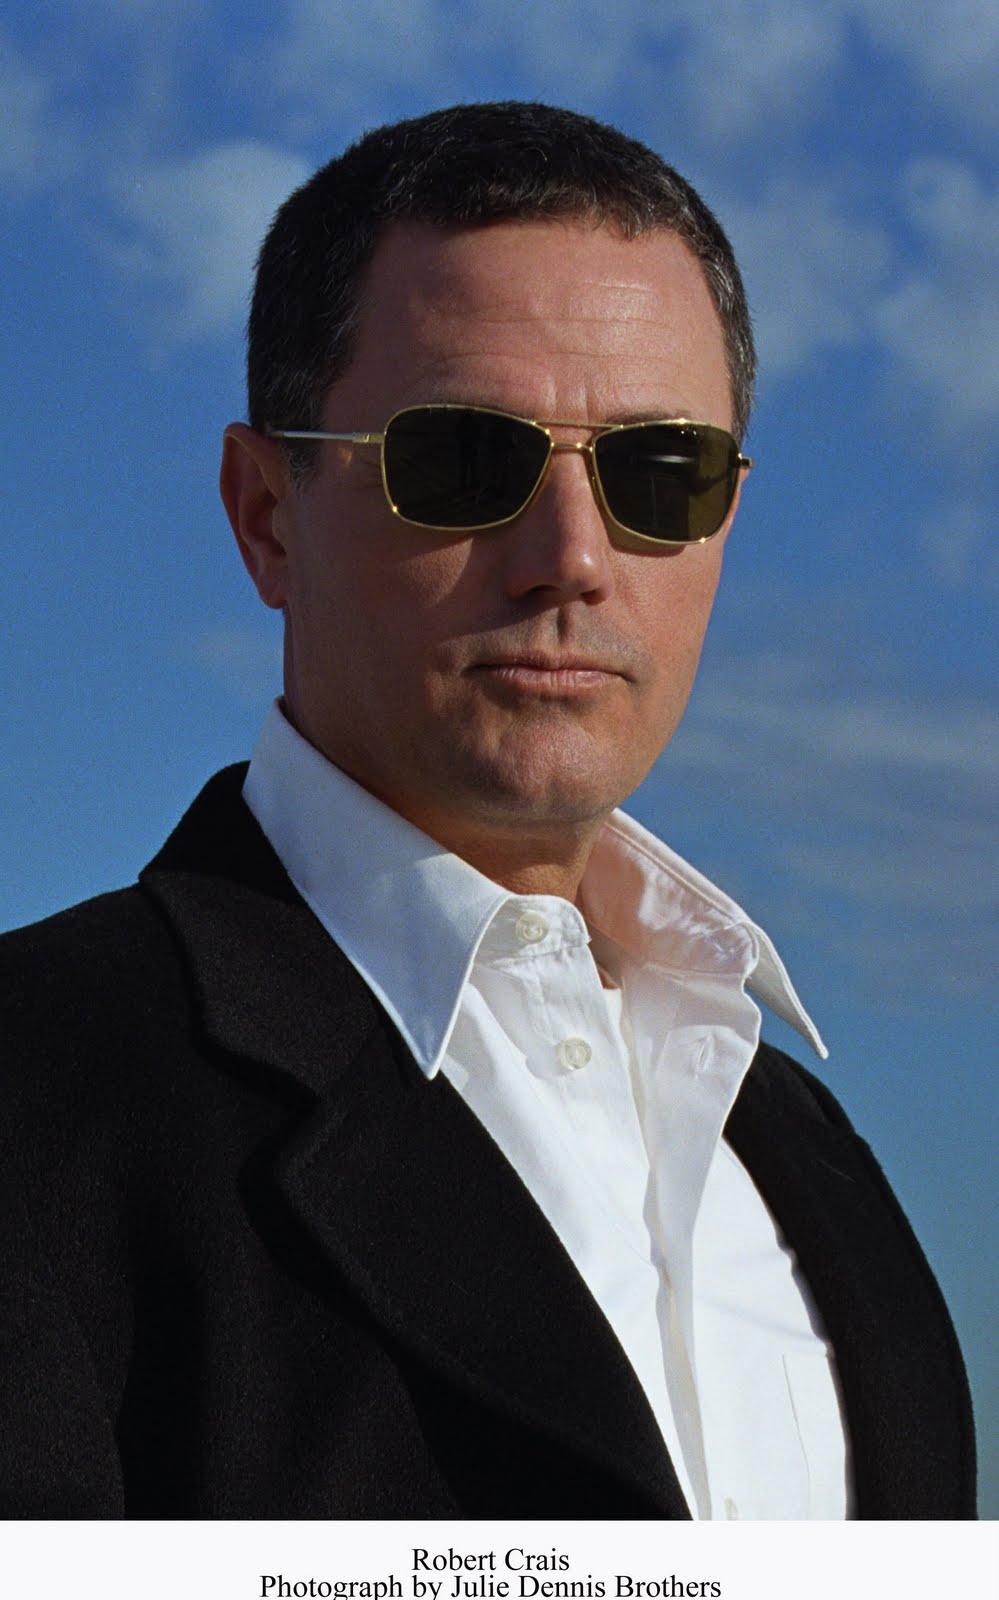 10 ELVIS COLE JOE PIKE Robert Crais lot FreWatchman Free Fall Last Detective Voo